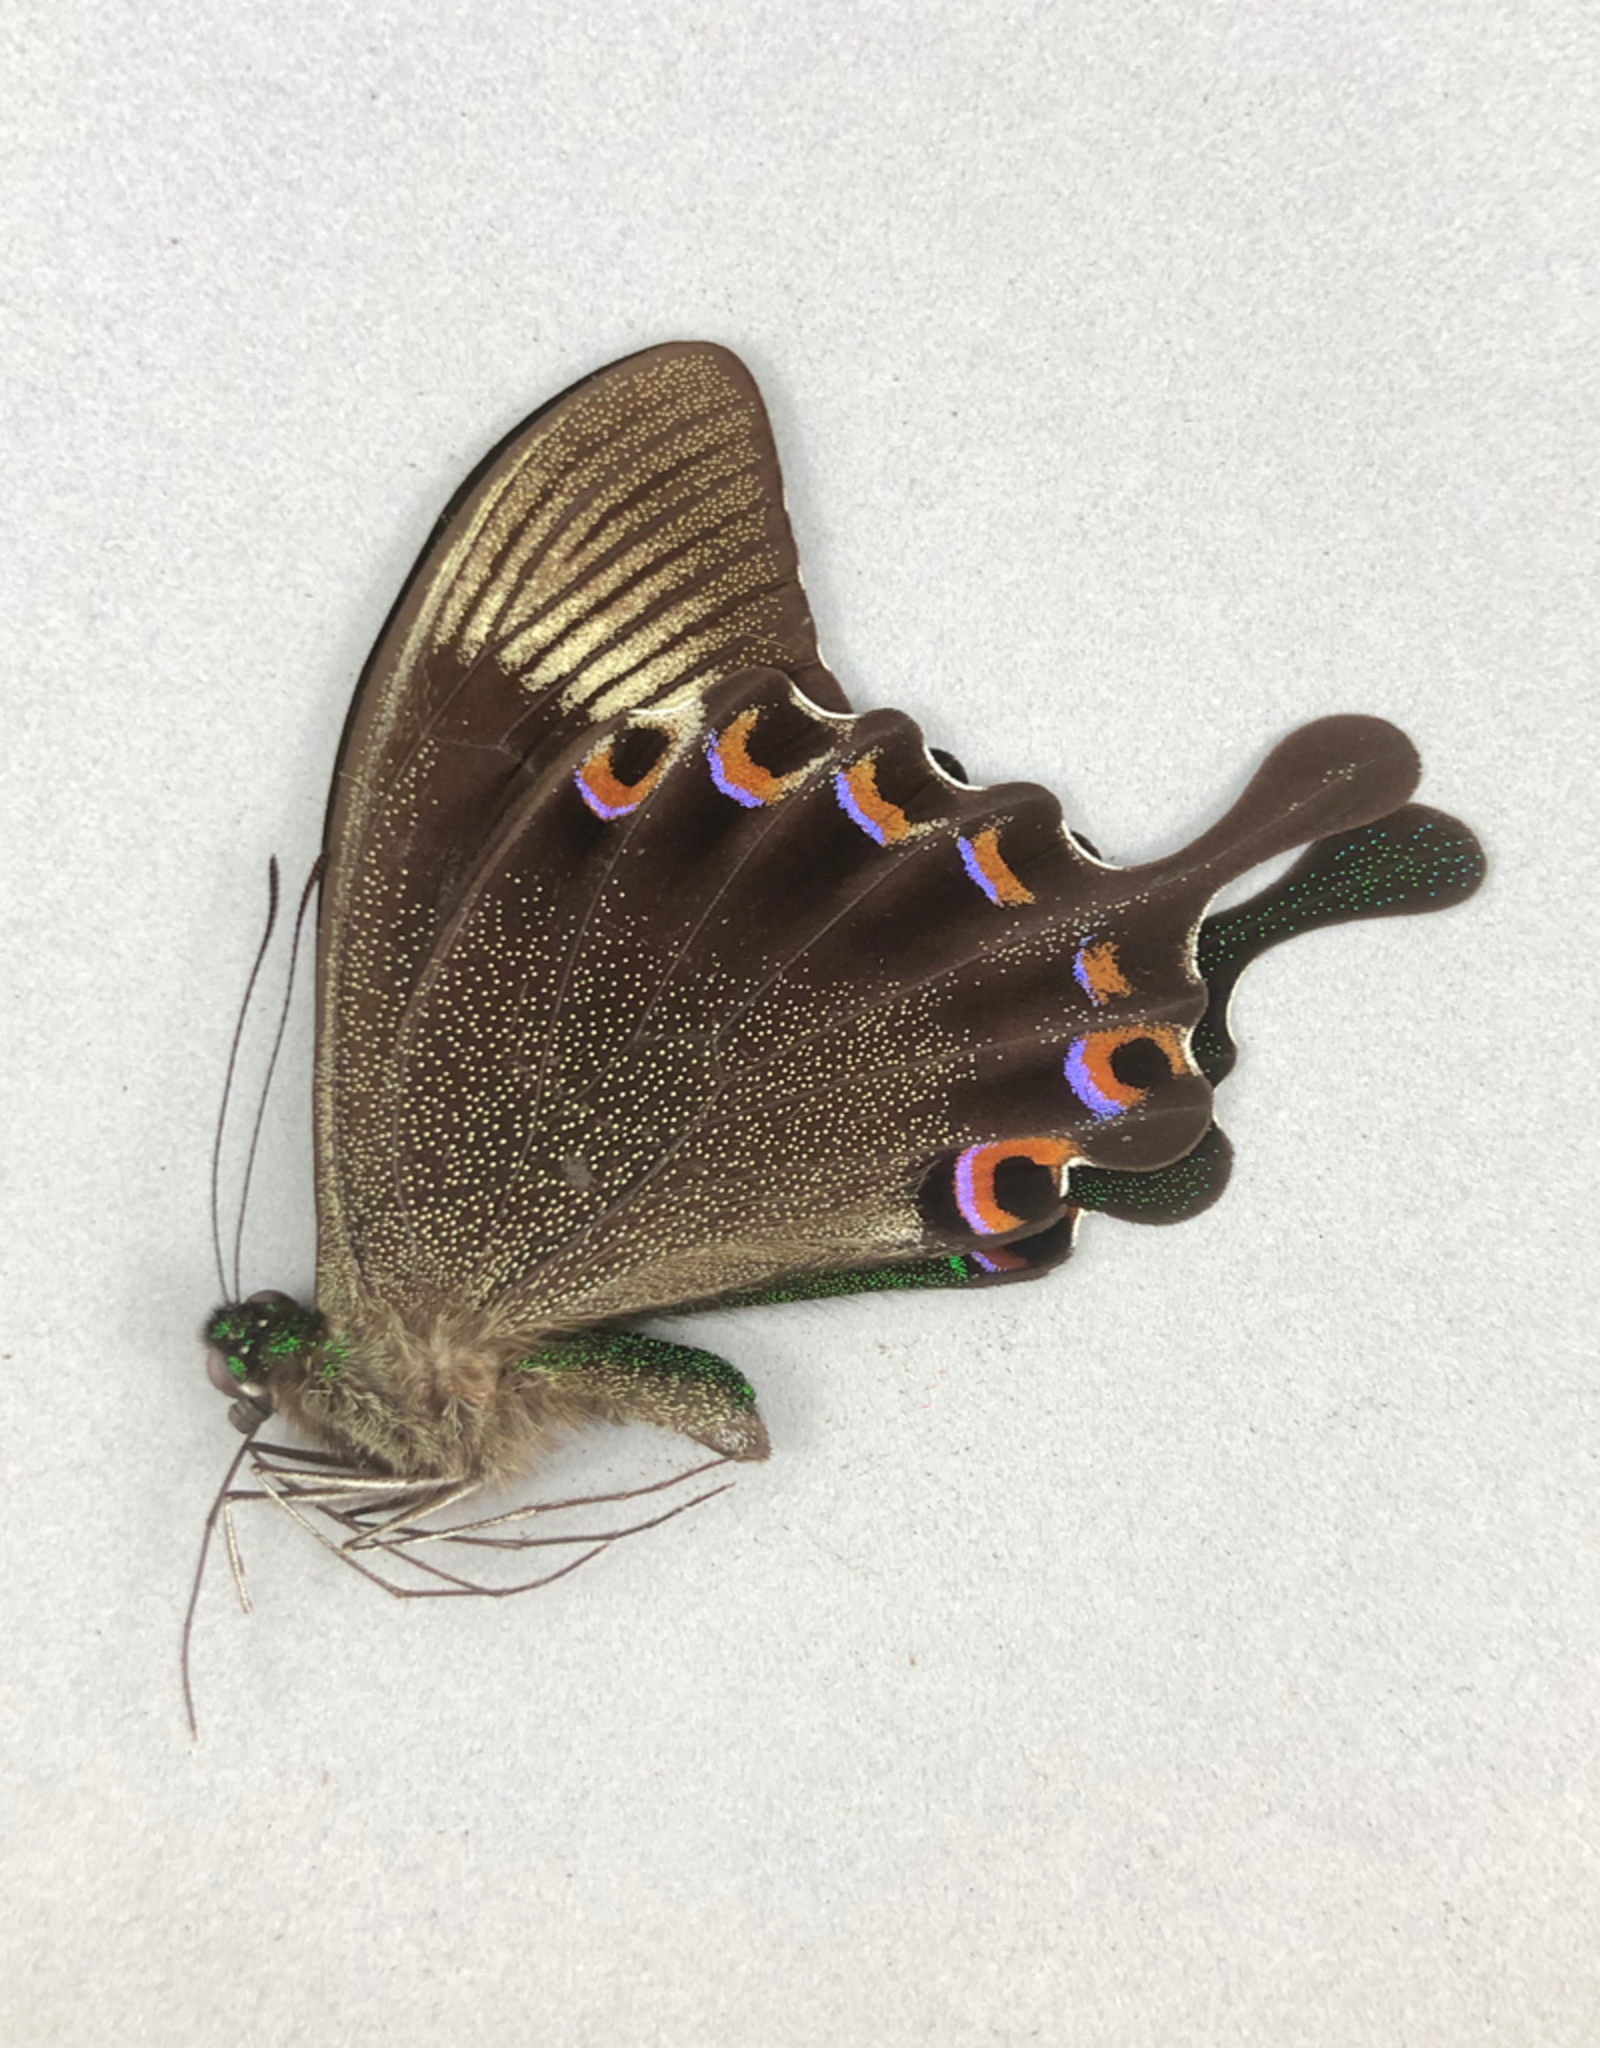 Papilio paris gedeensis M A1 Indonesia